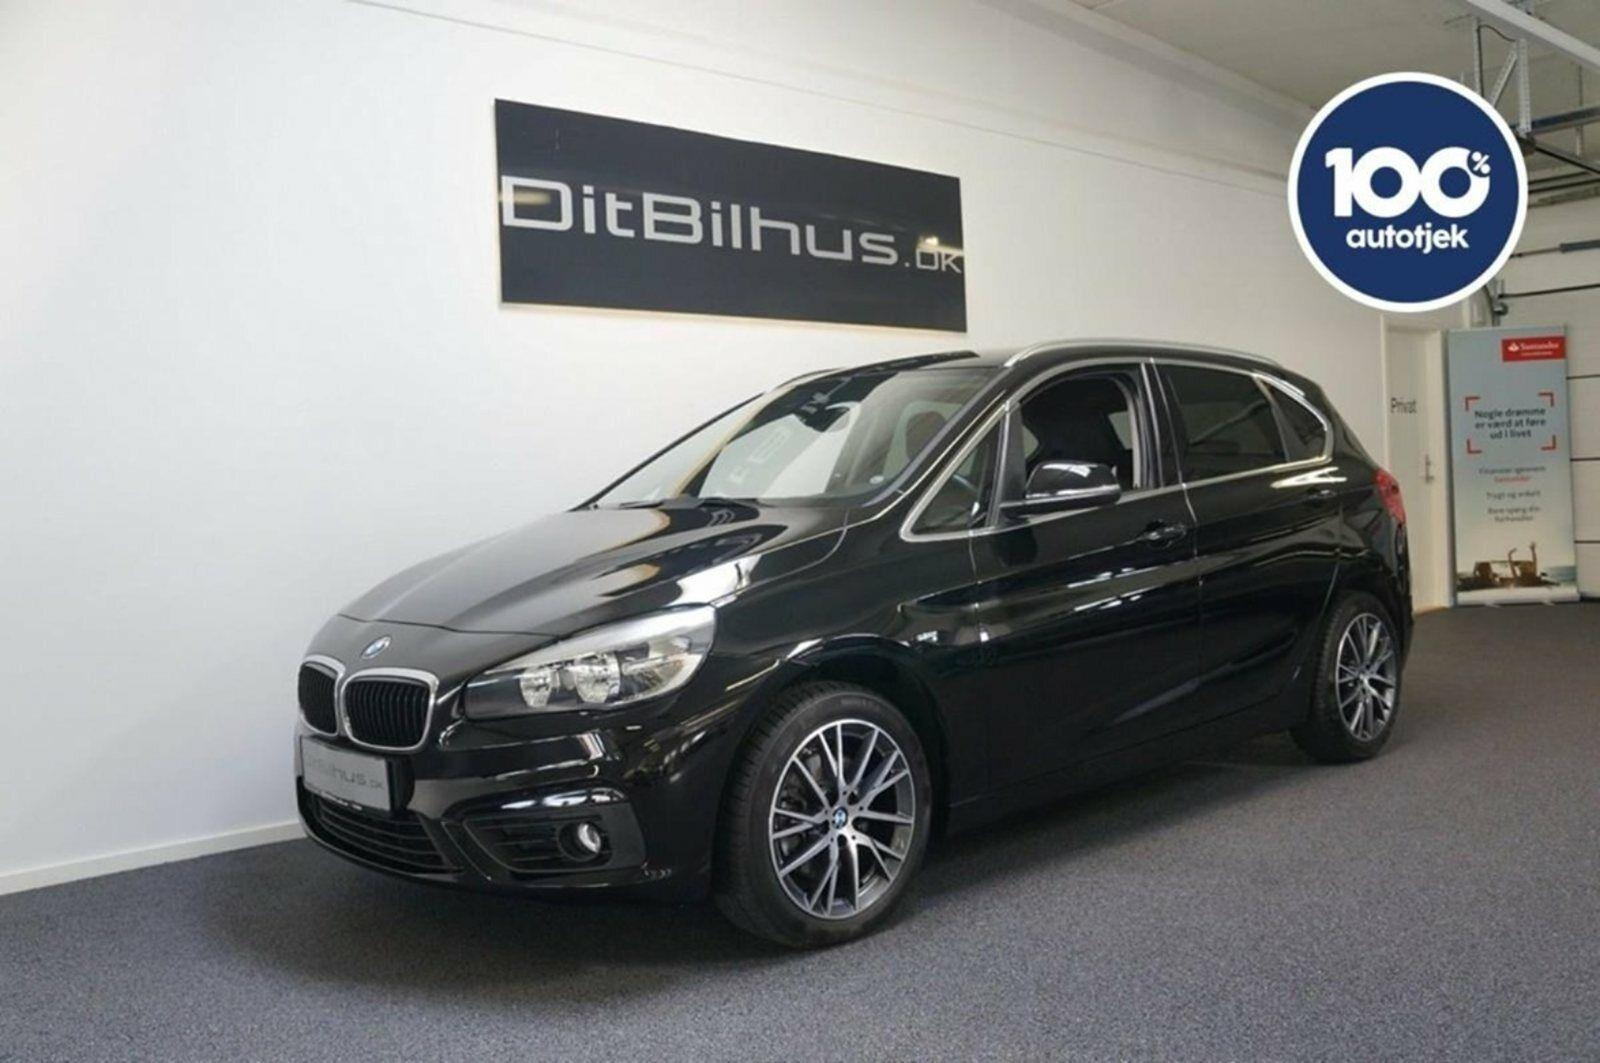 BMW 218i 1,5 Active Tourer Advantage 5d - 248.888 kr.